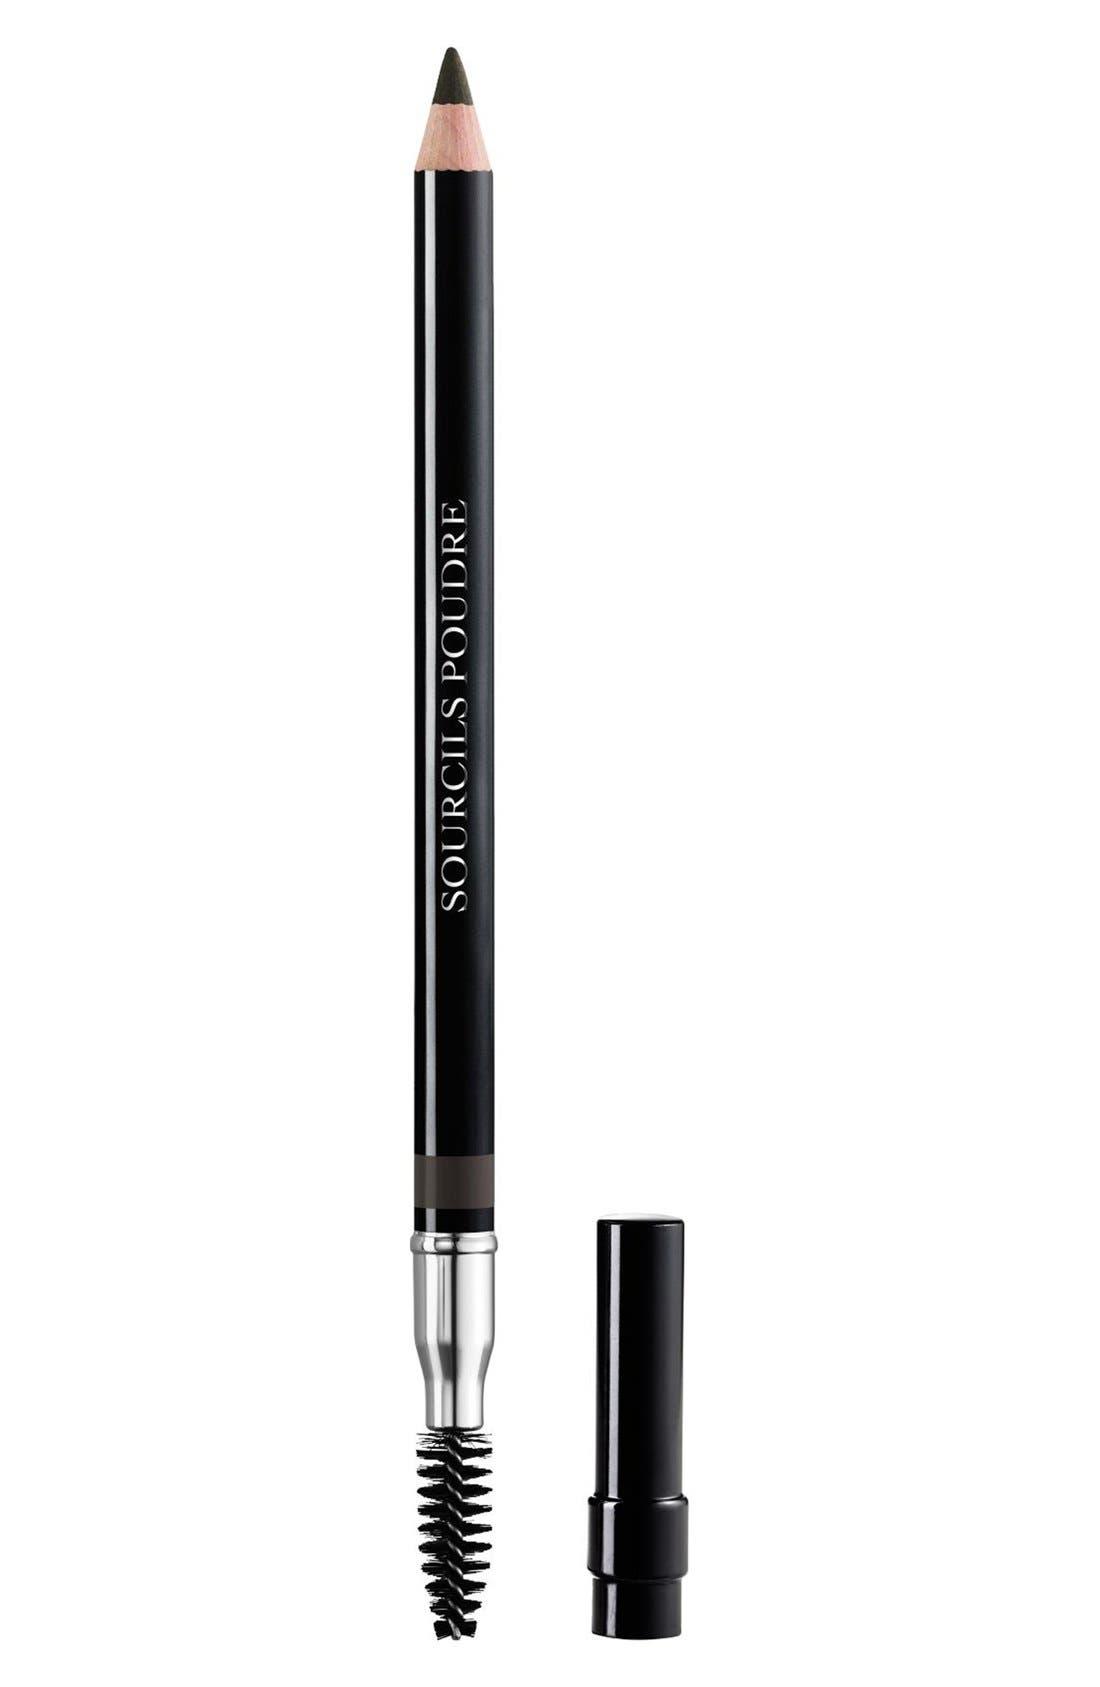 DIOR, Sourcils Poudre Powder Eyebrow Pencil, Main thumbnail 1, color, 093 BLACK